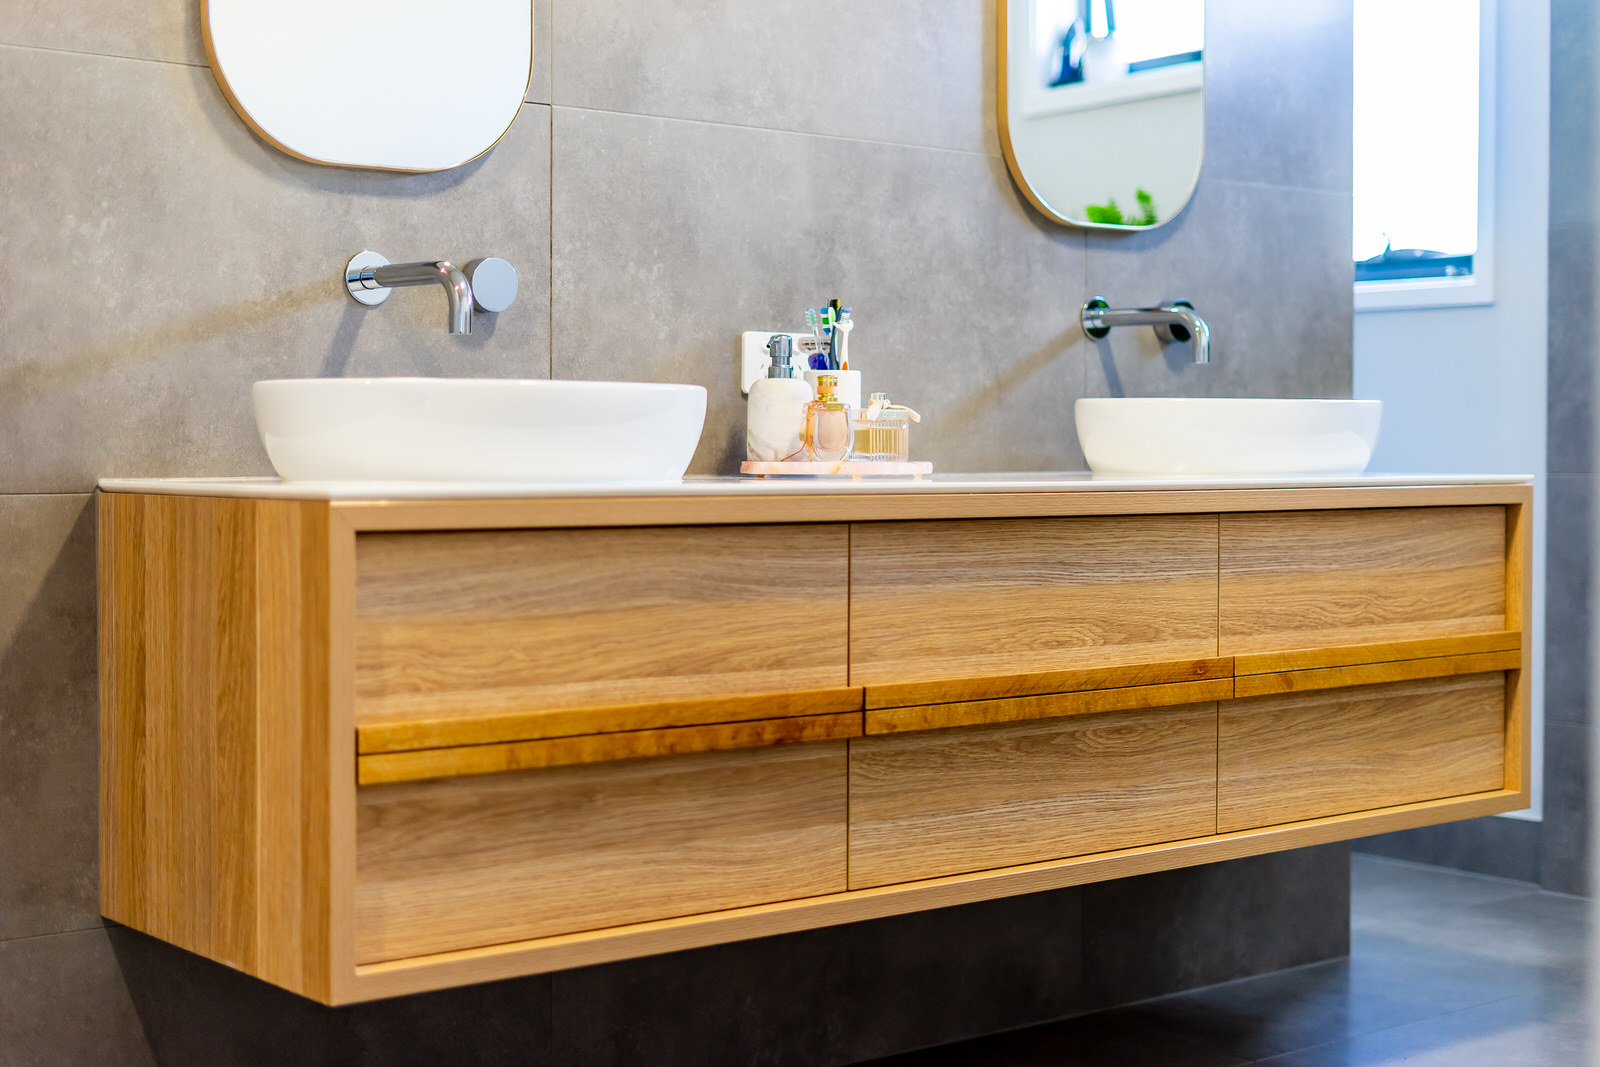 wooden bathroom vanity 2 sinks in Sorrento bathroom renovation